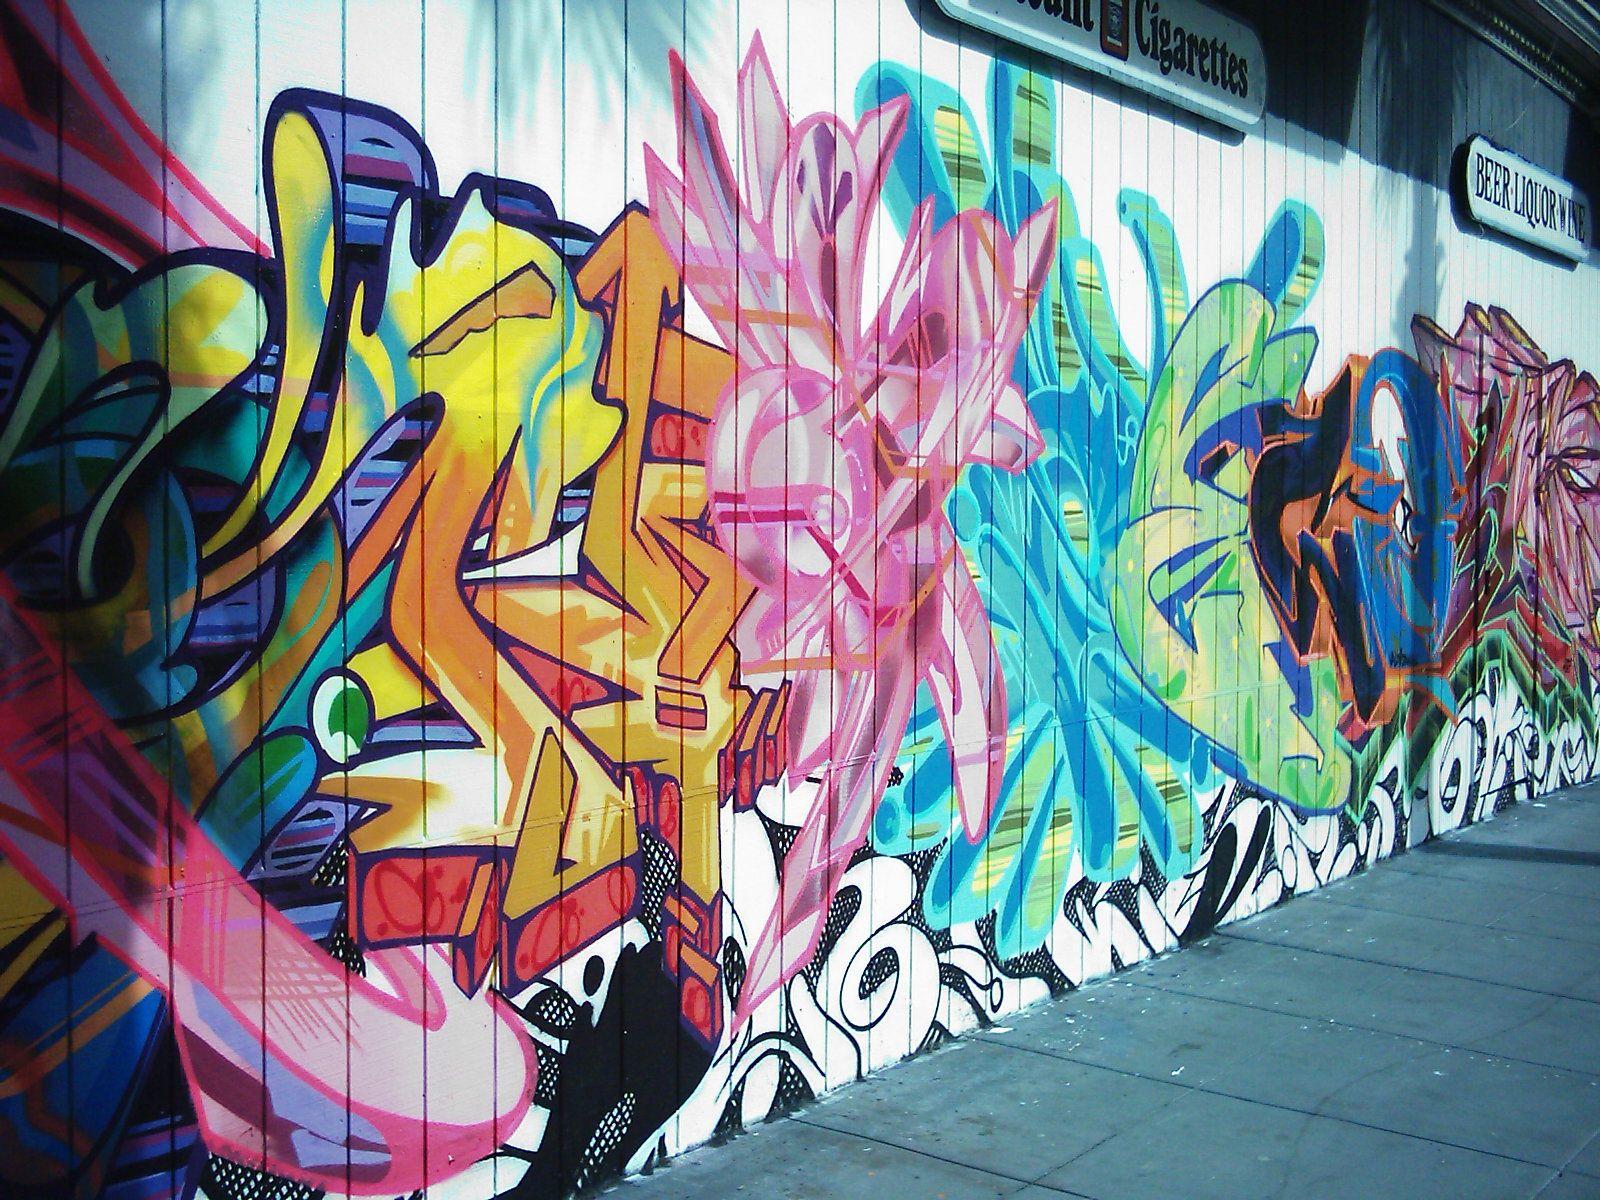 Graffiti wallpaper hd background street graffiti for th neety graffiti hd backgrounds wallpapers free backgrounds and wallpapers voltagebd Image collections